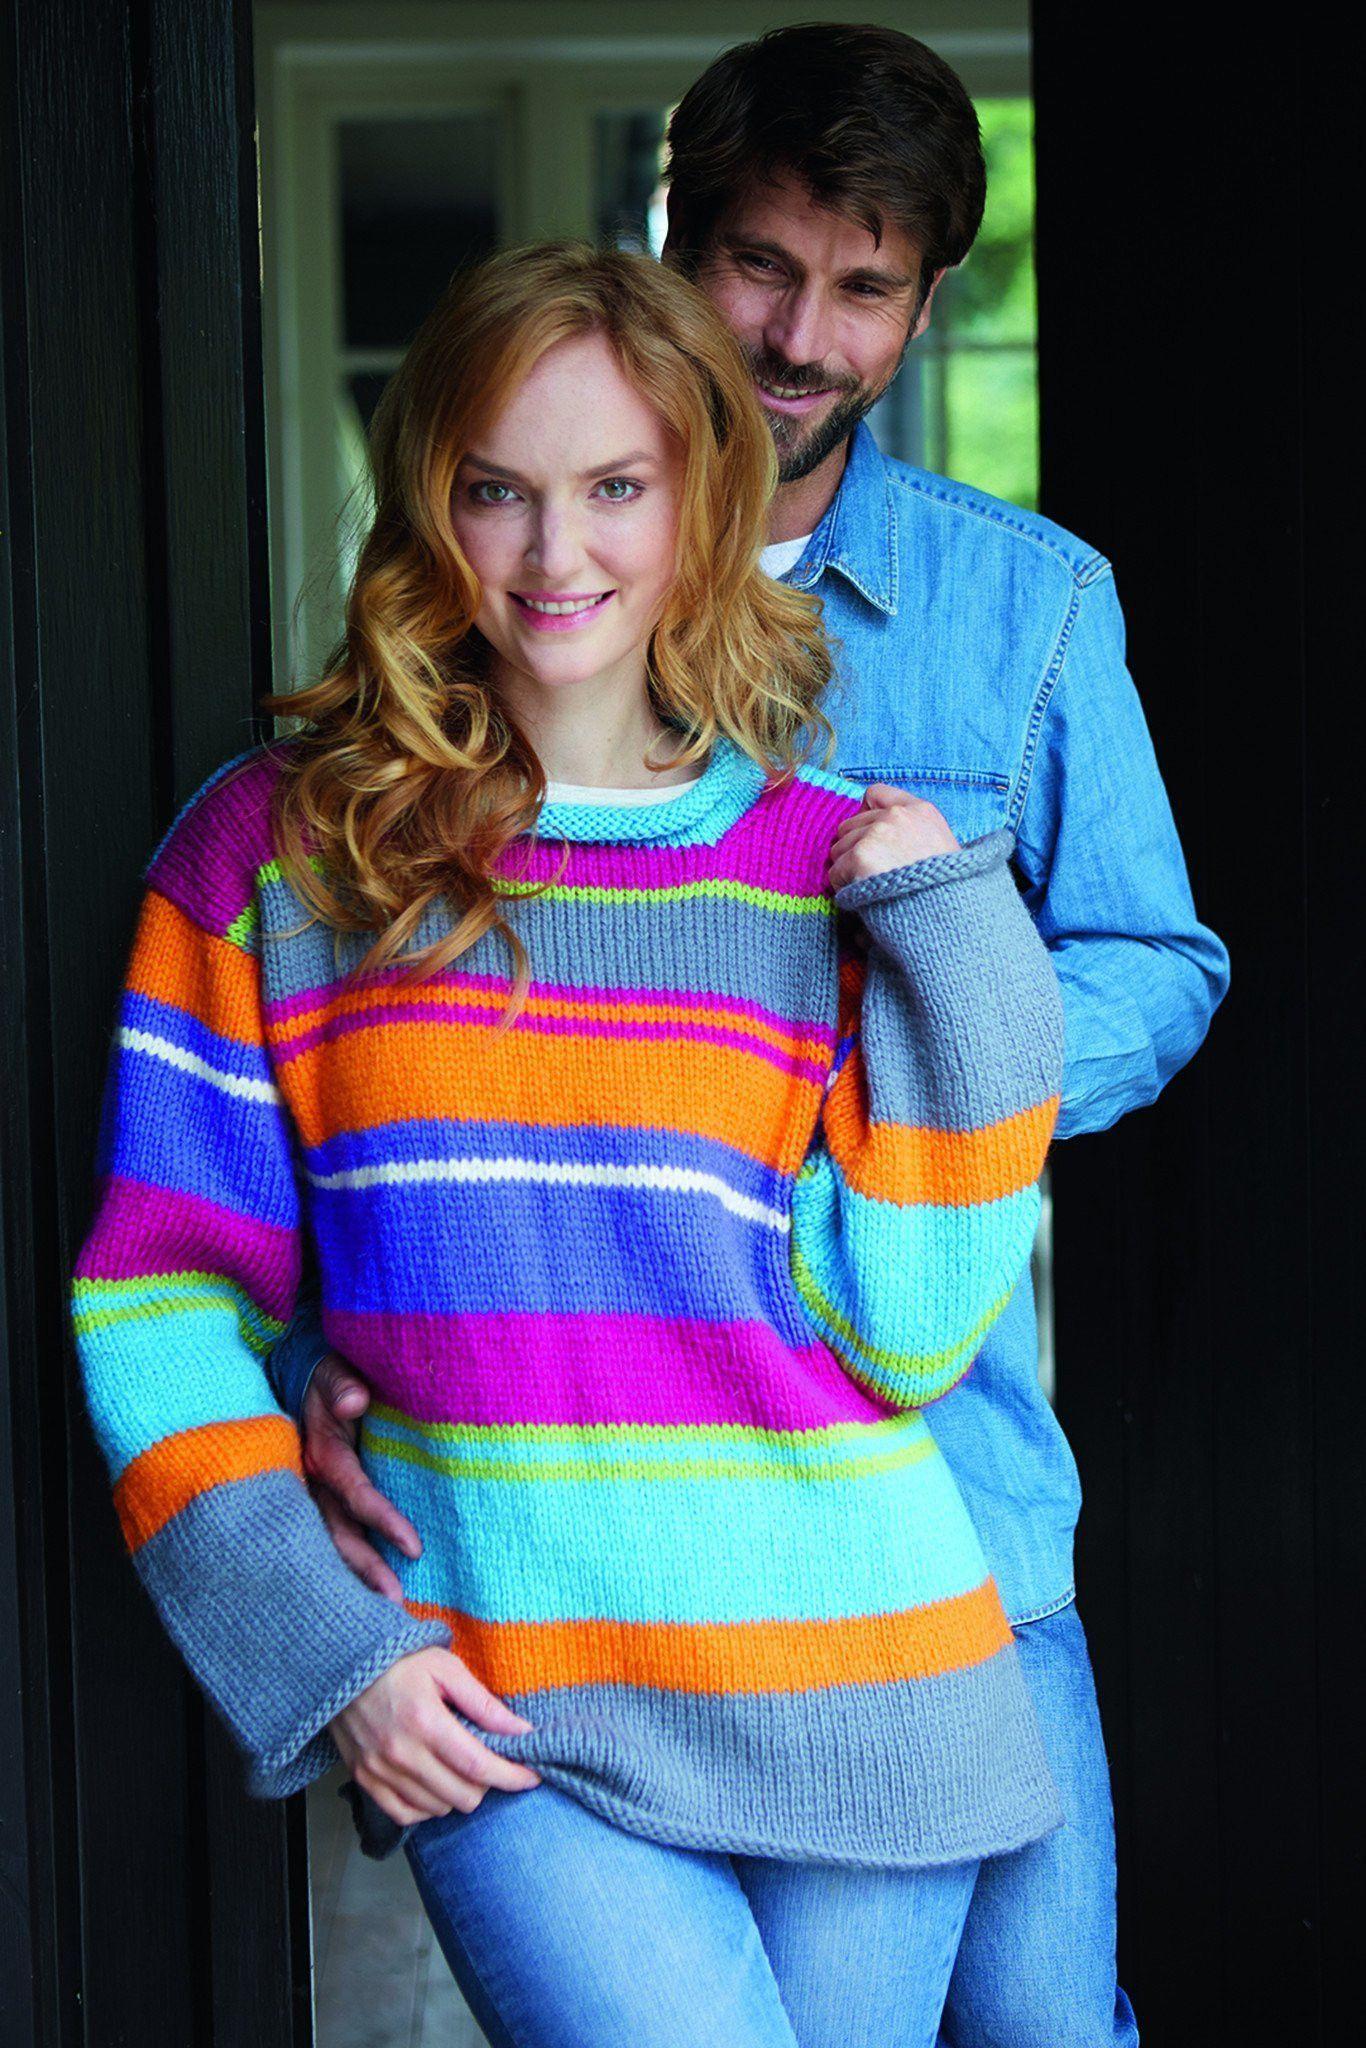 Striped Unisex Jumper Knitting Pattern   The Knitting Network